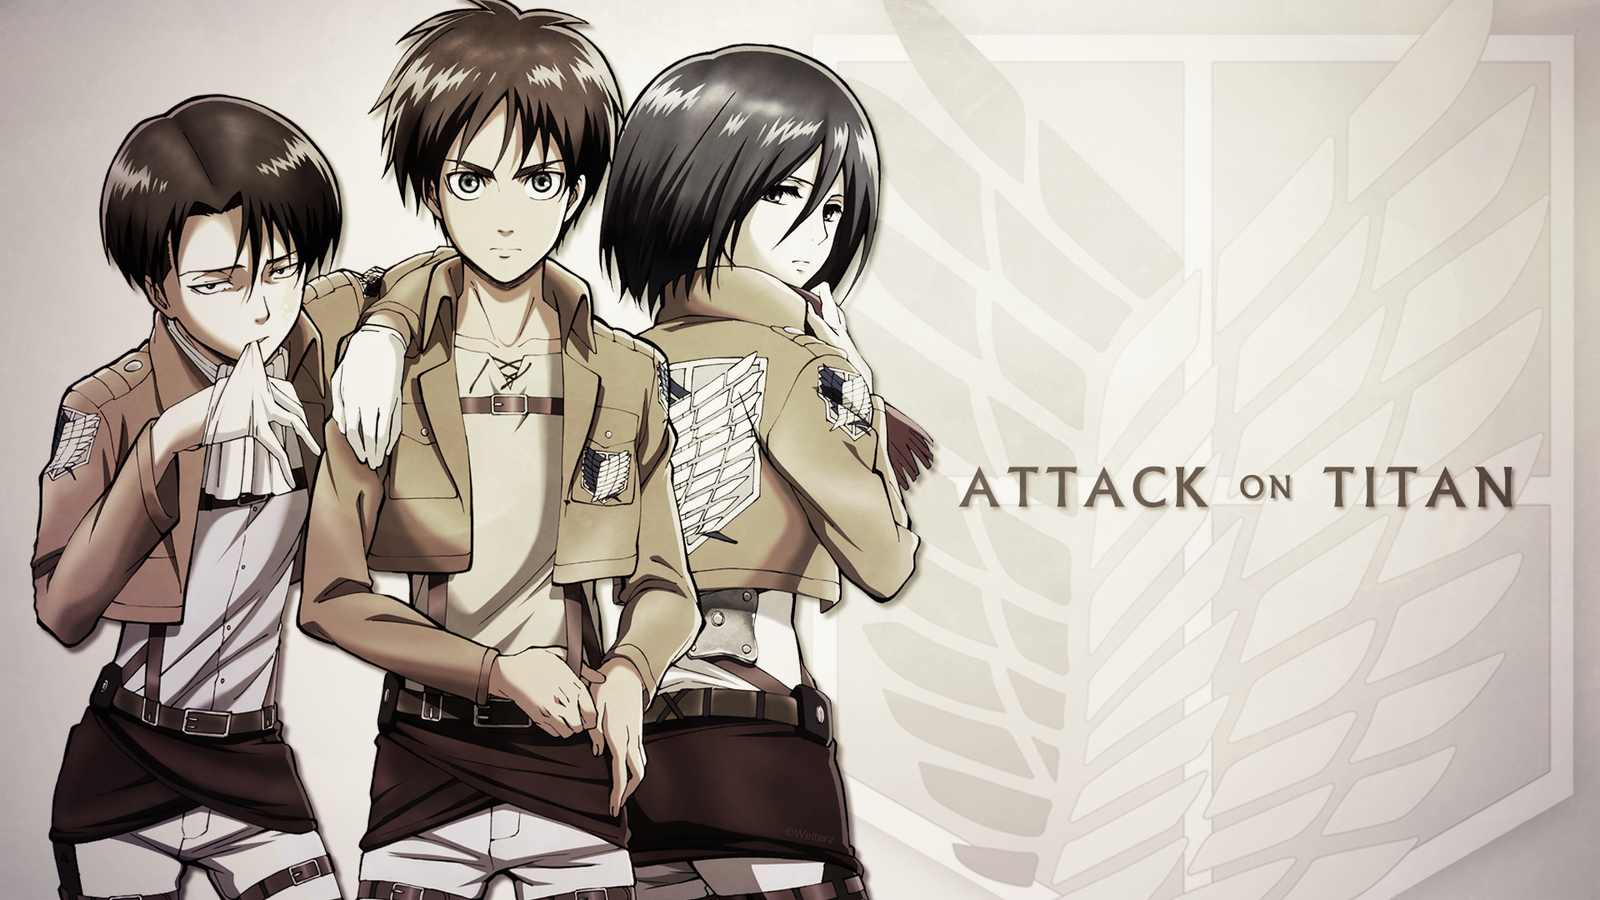 Attack On Titan Eren Levi Mikasa By Welterz On Deviantart Attack On Titan Attack On Titan Eren Attack On Titan Game